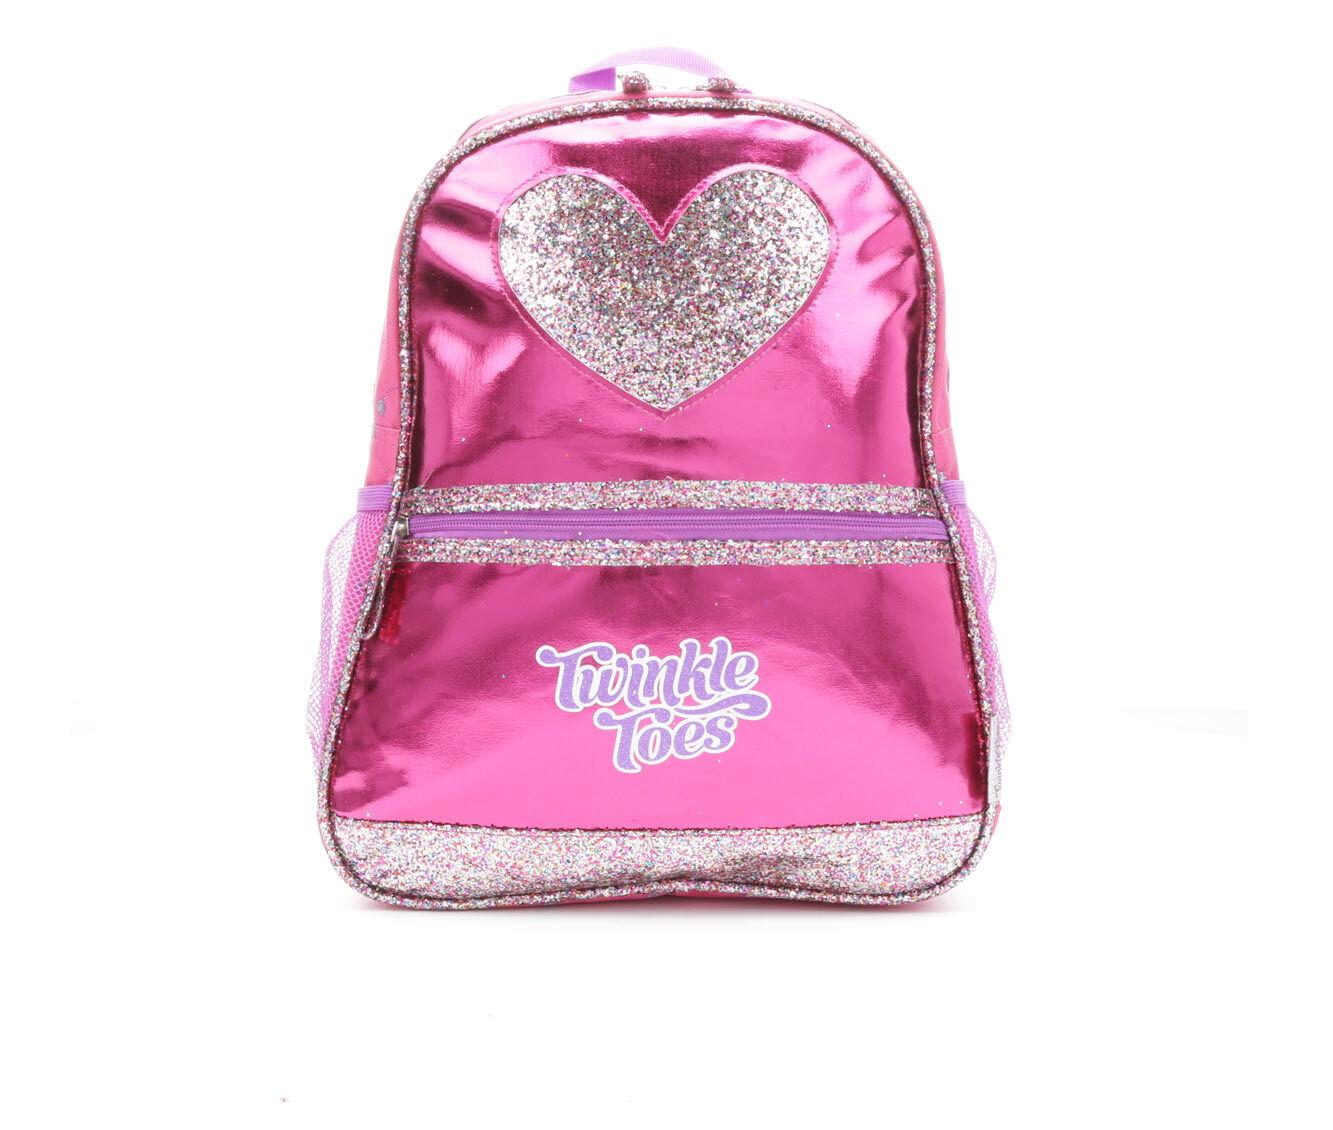 Skechers accessories all heart backpack shoe carnival jpg 1694x1436 Heart  backpack 7586a58f22242